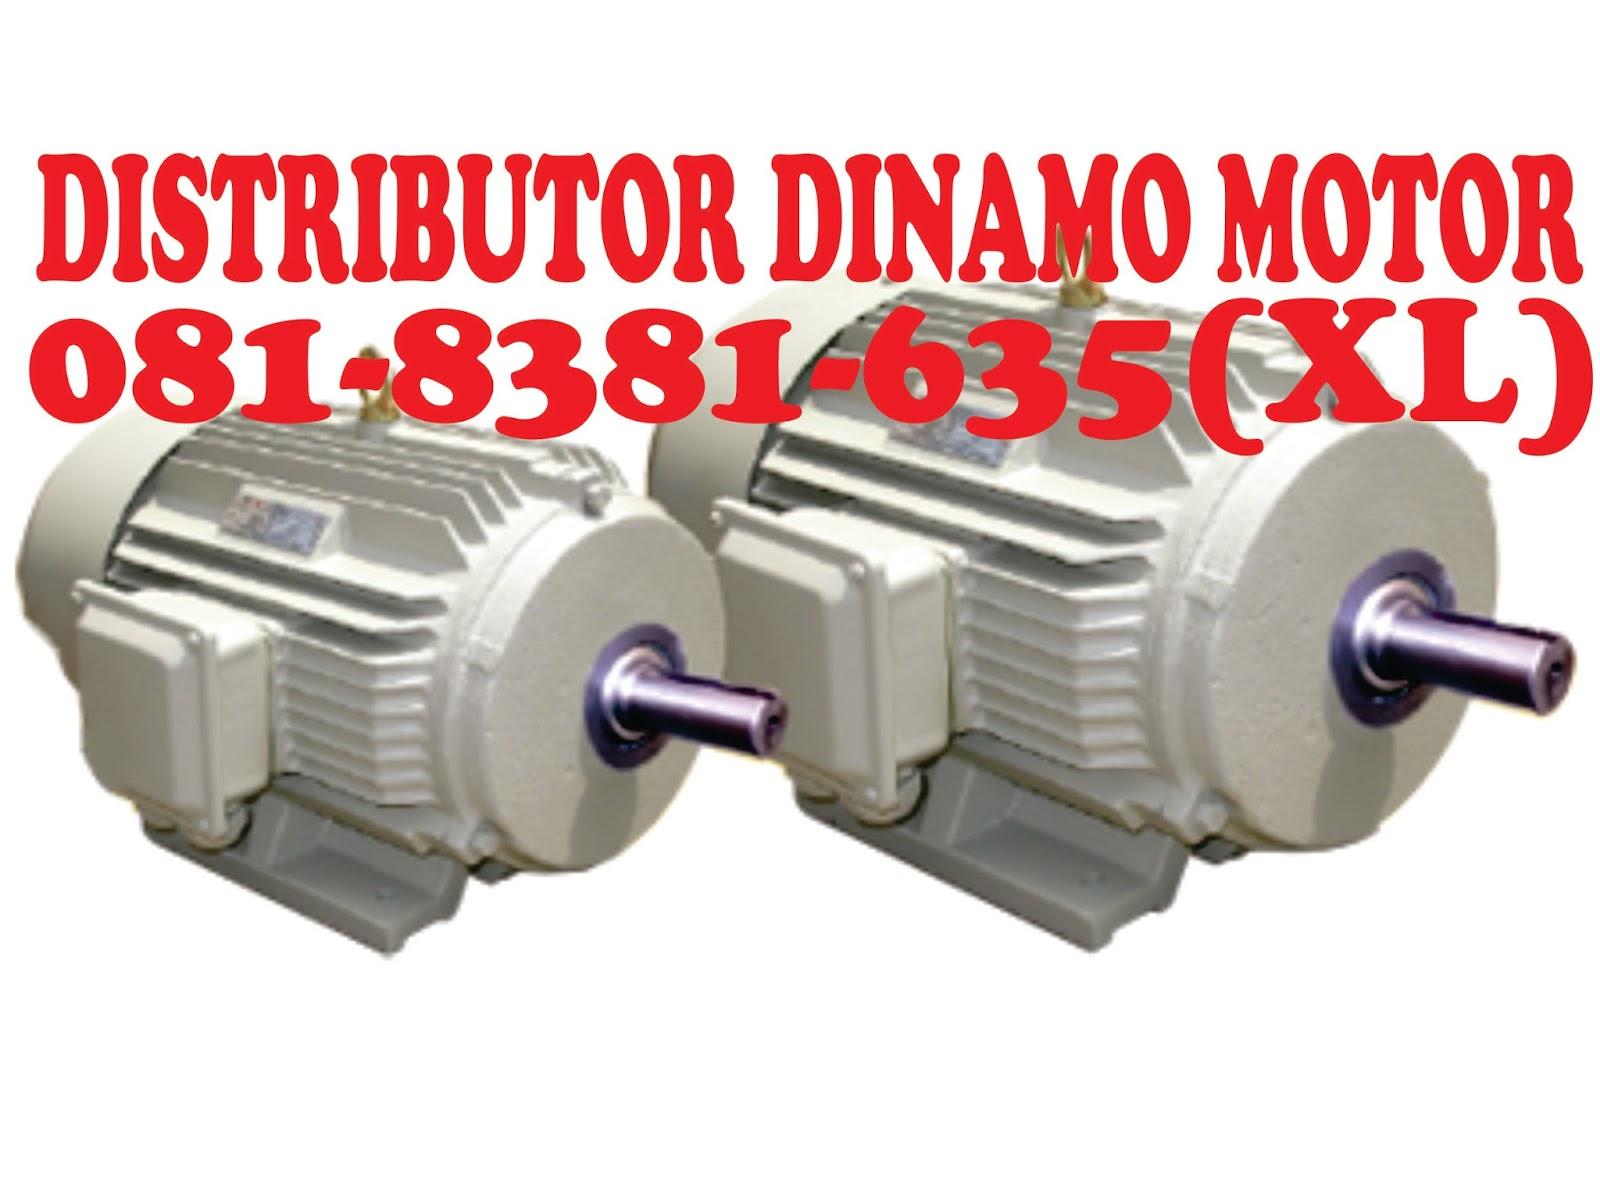 Dinamo Motor Banyuwangi 081 8381 635 Xl Jual Dinamo Elektro Motor